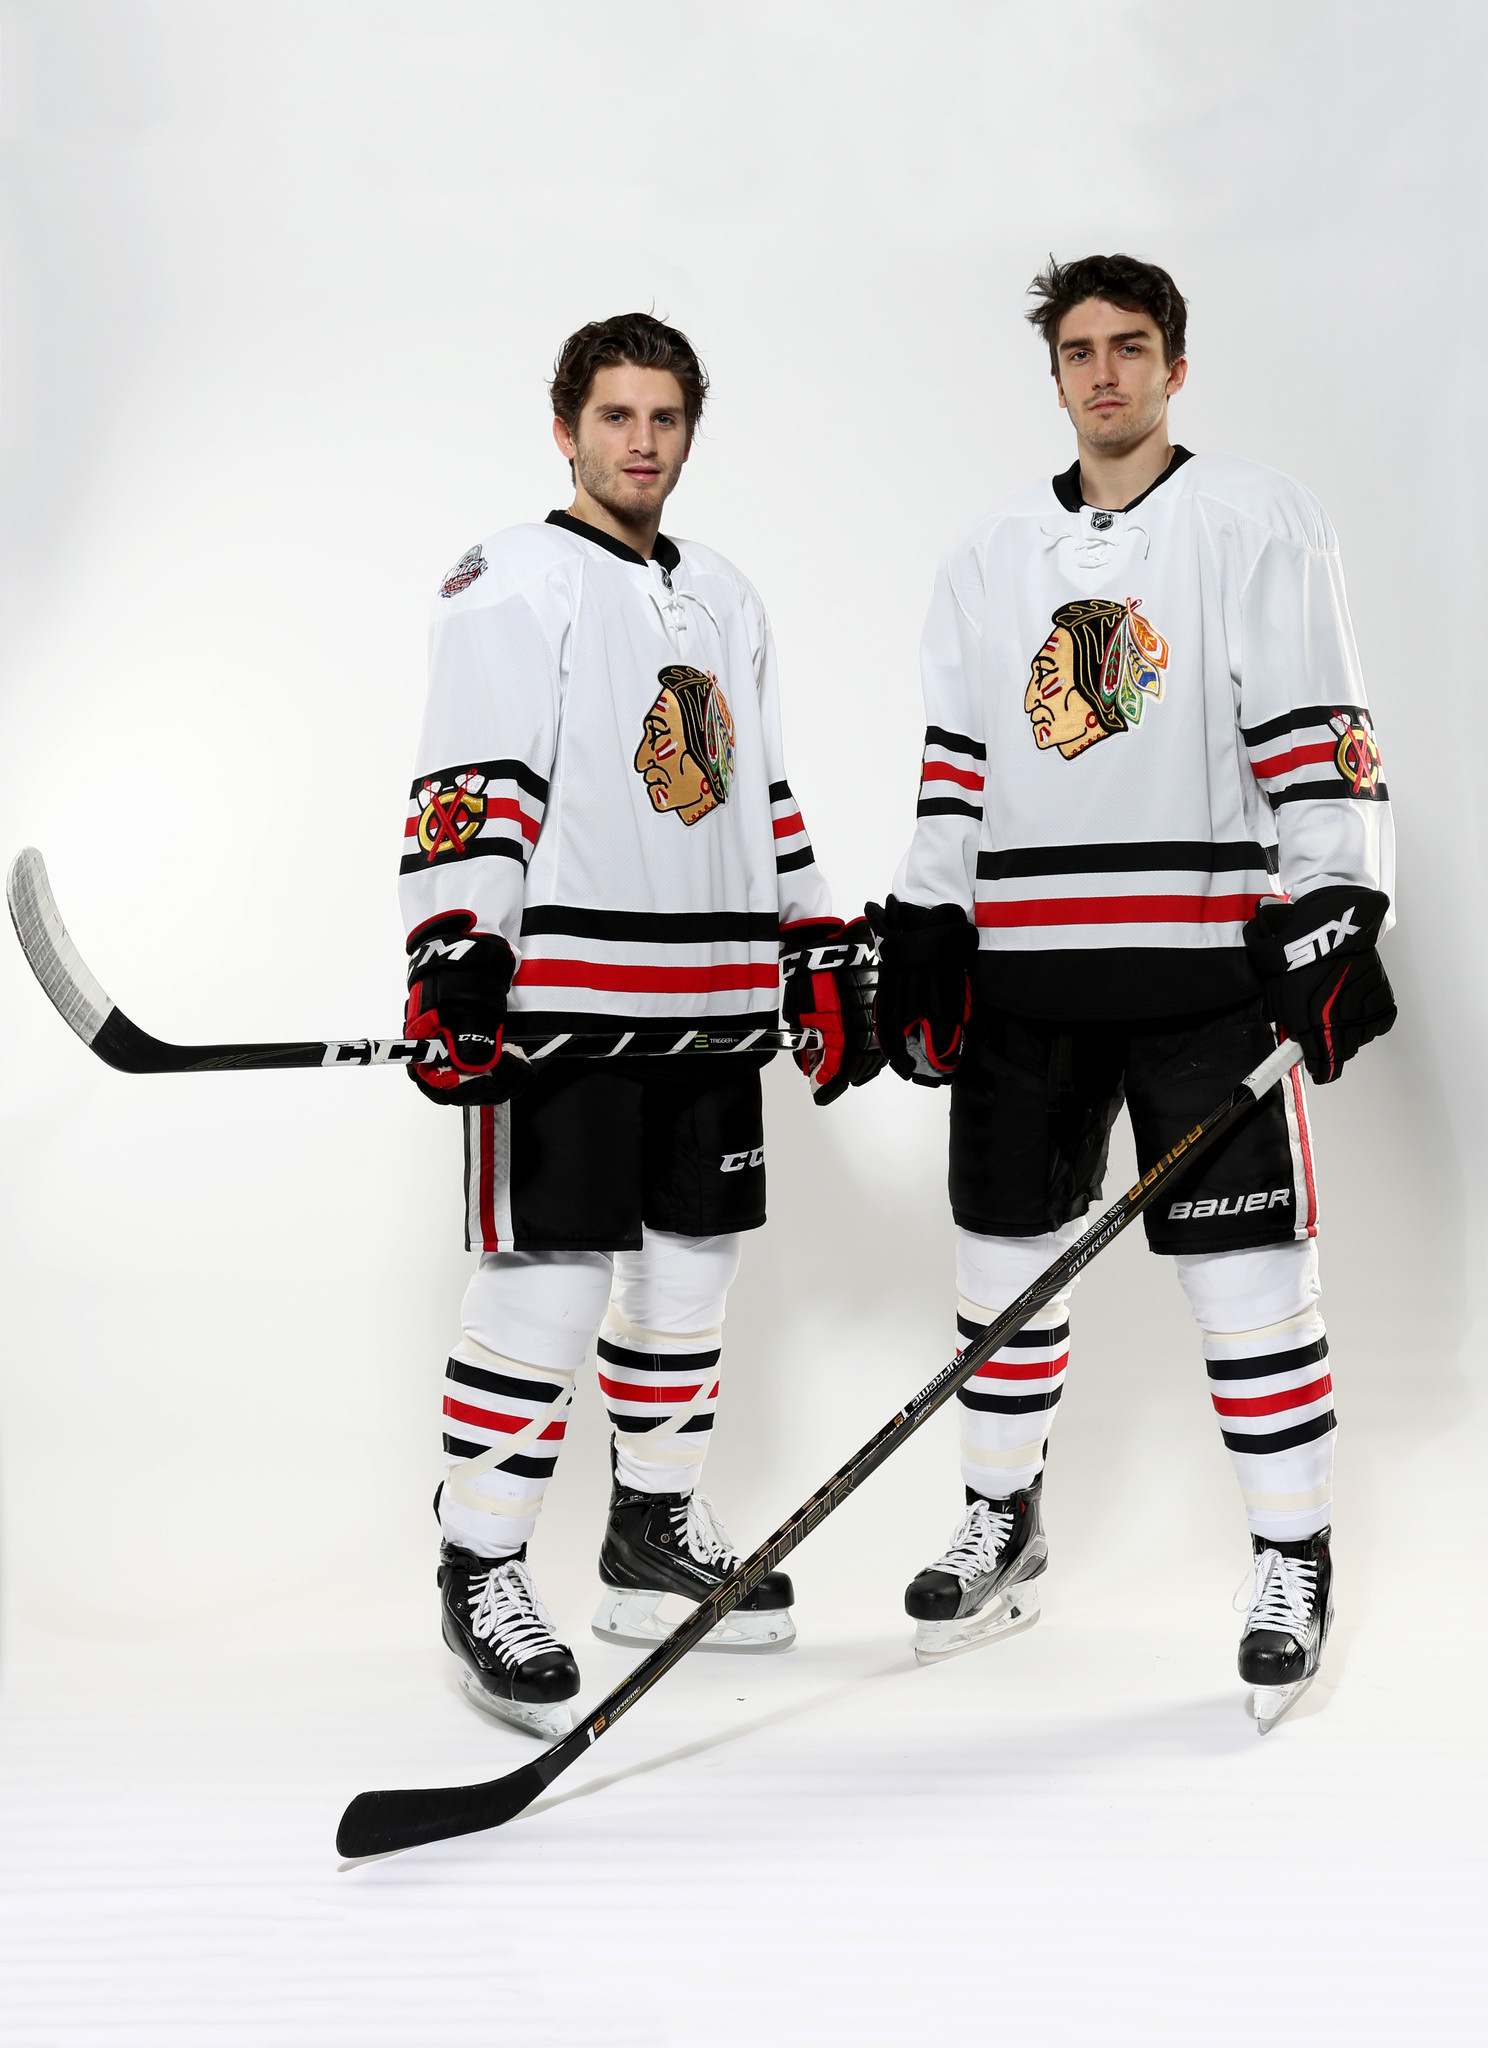 8eae508b31c Blackhawks unveil Winter Classic uniforms - Chicago Tribune